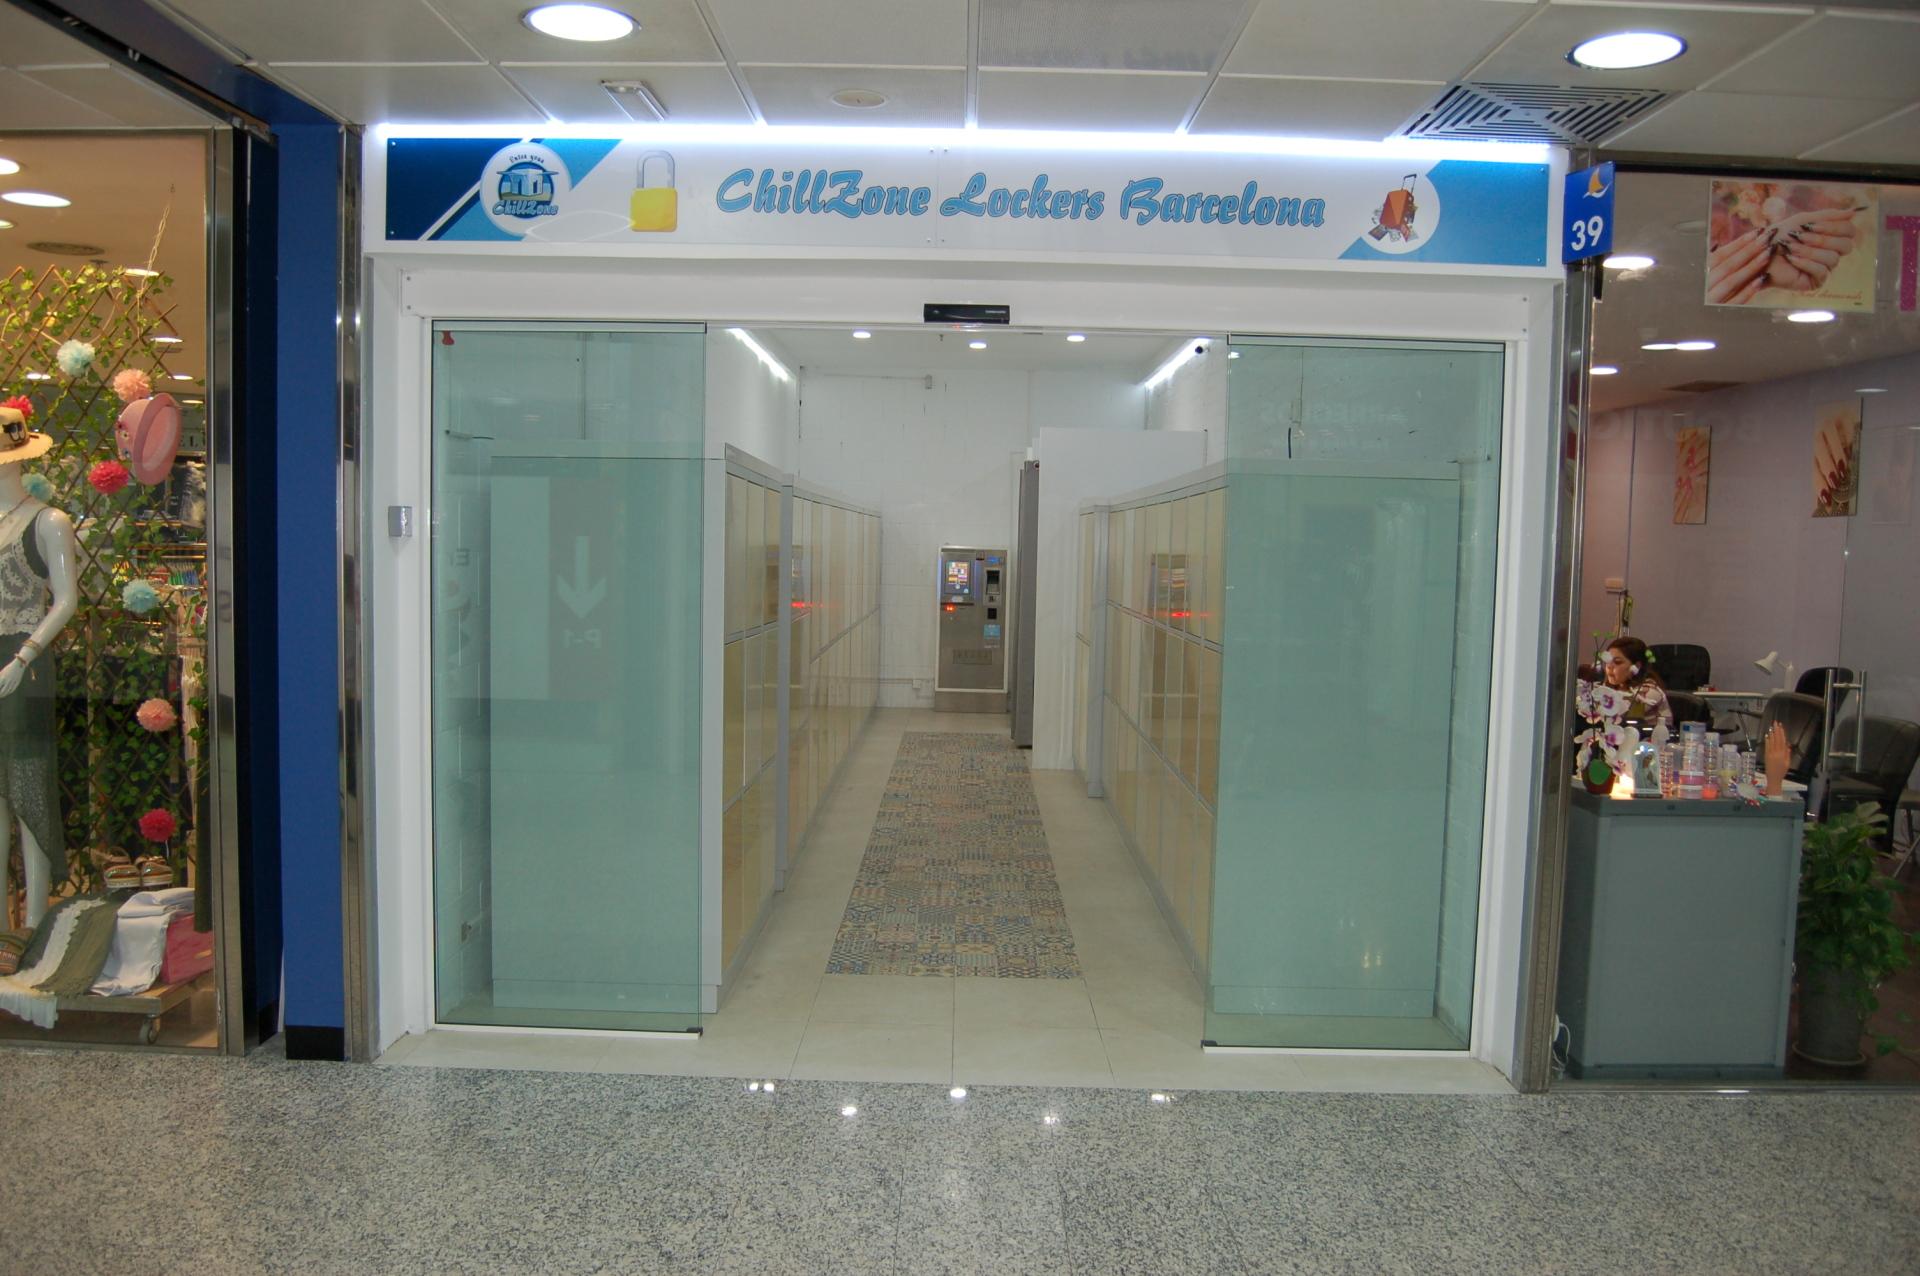 Entrance ChillZone Lockers Barcelona